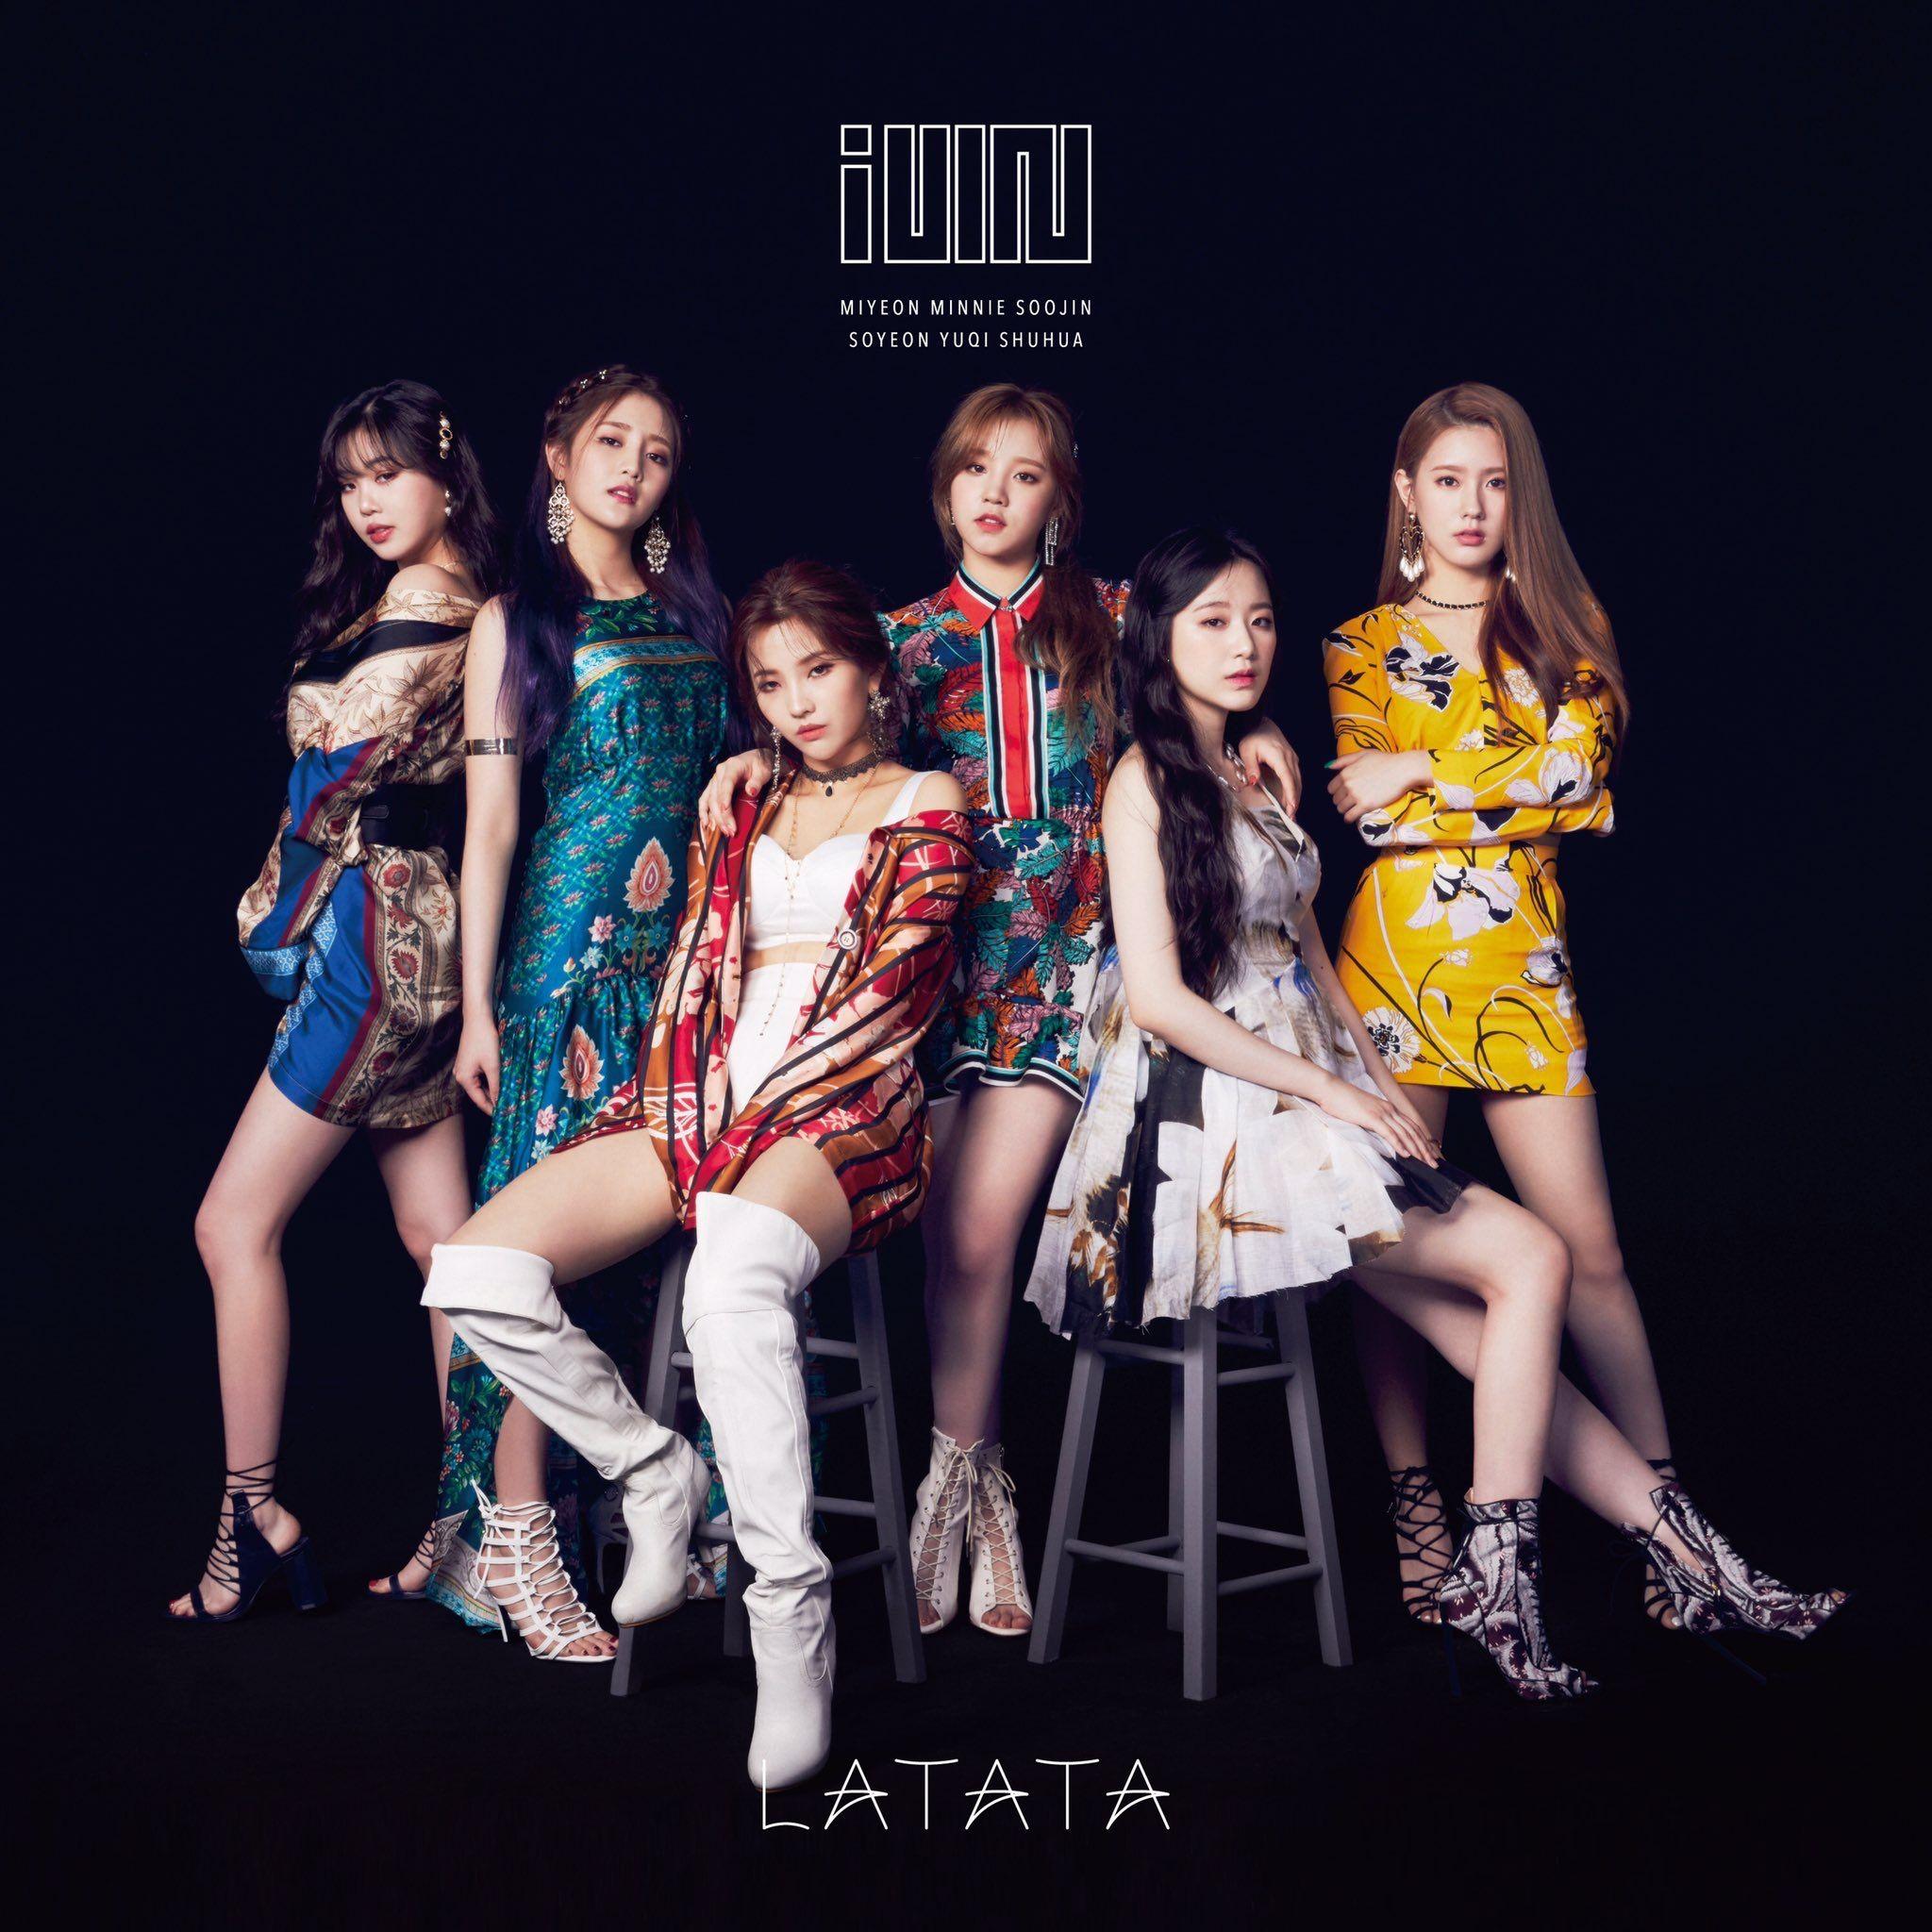 Latata Japanese Version 7 31 19 Latata Idle Gidle Kpop Yuqi Soyeon Shuhua Soojin Minnie Miyeon Kpop Girls South Korean Girls Neverland